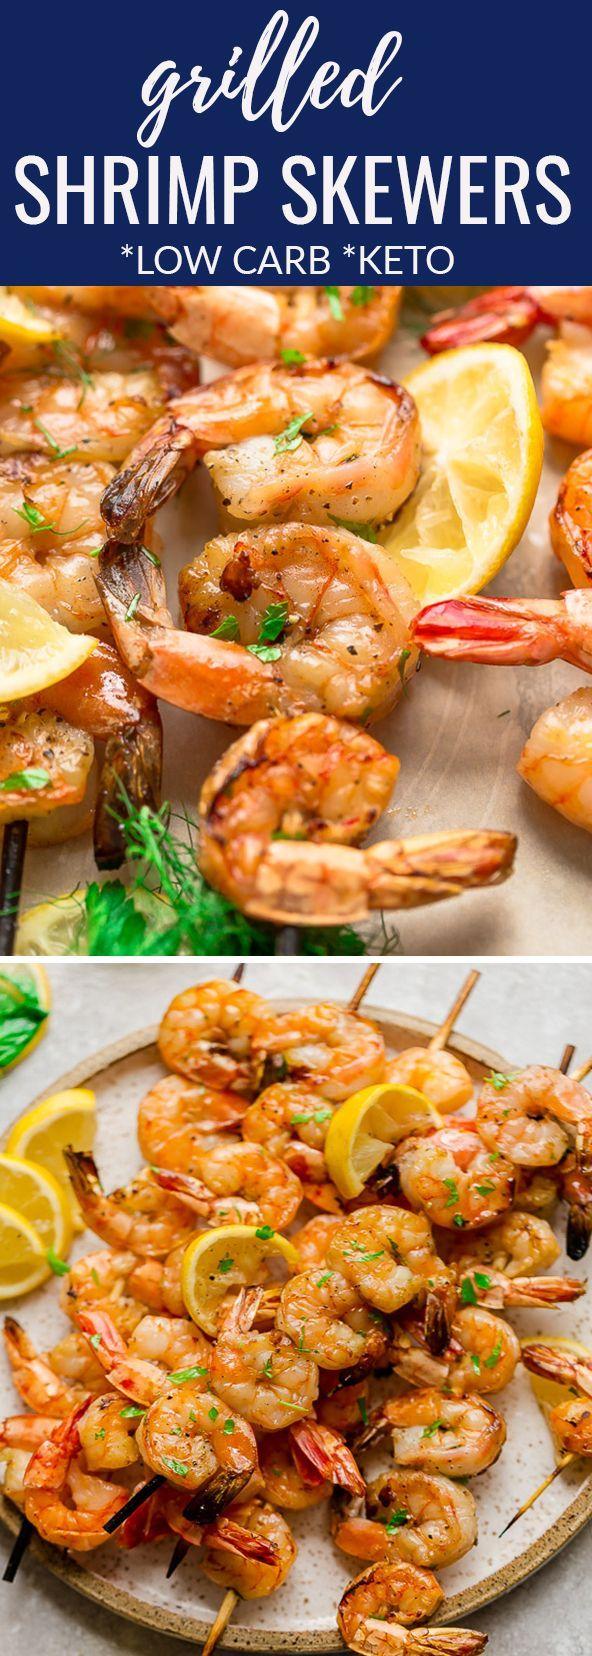 Low Carb Shrimp Kebabs with Lemon Butter Sauce - Life Made Keto Low Carb Shrimp Kebabs with Lemon B